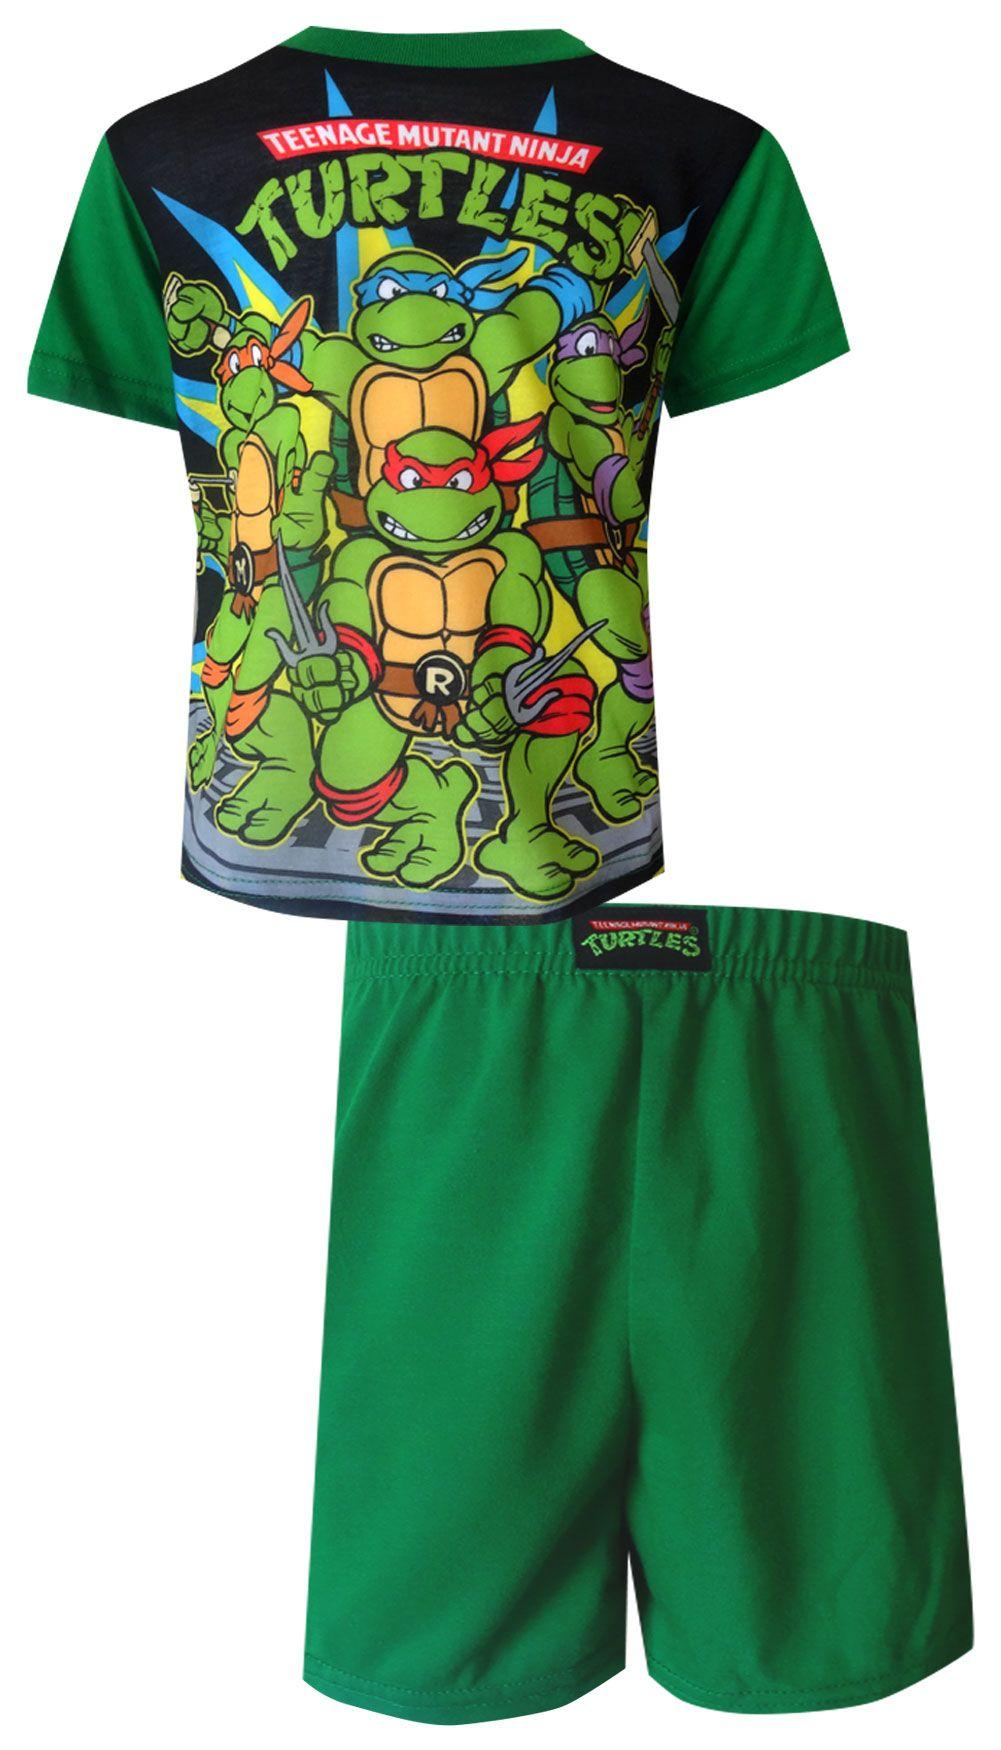 48c5a9ec415 Teenage Mutant Ninja Turtle Gang Green Toddler Pajama Wow